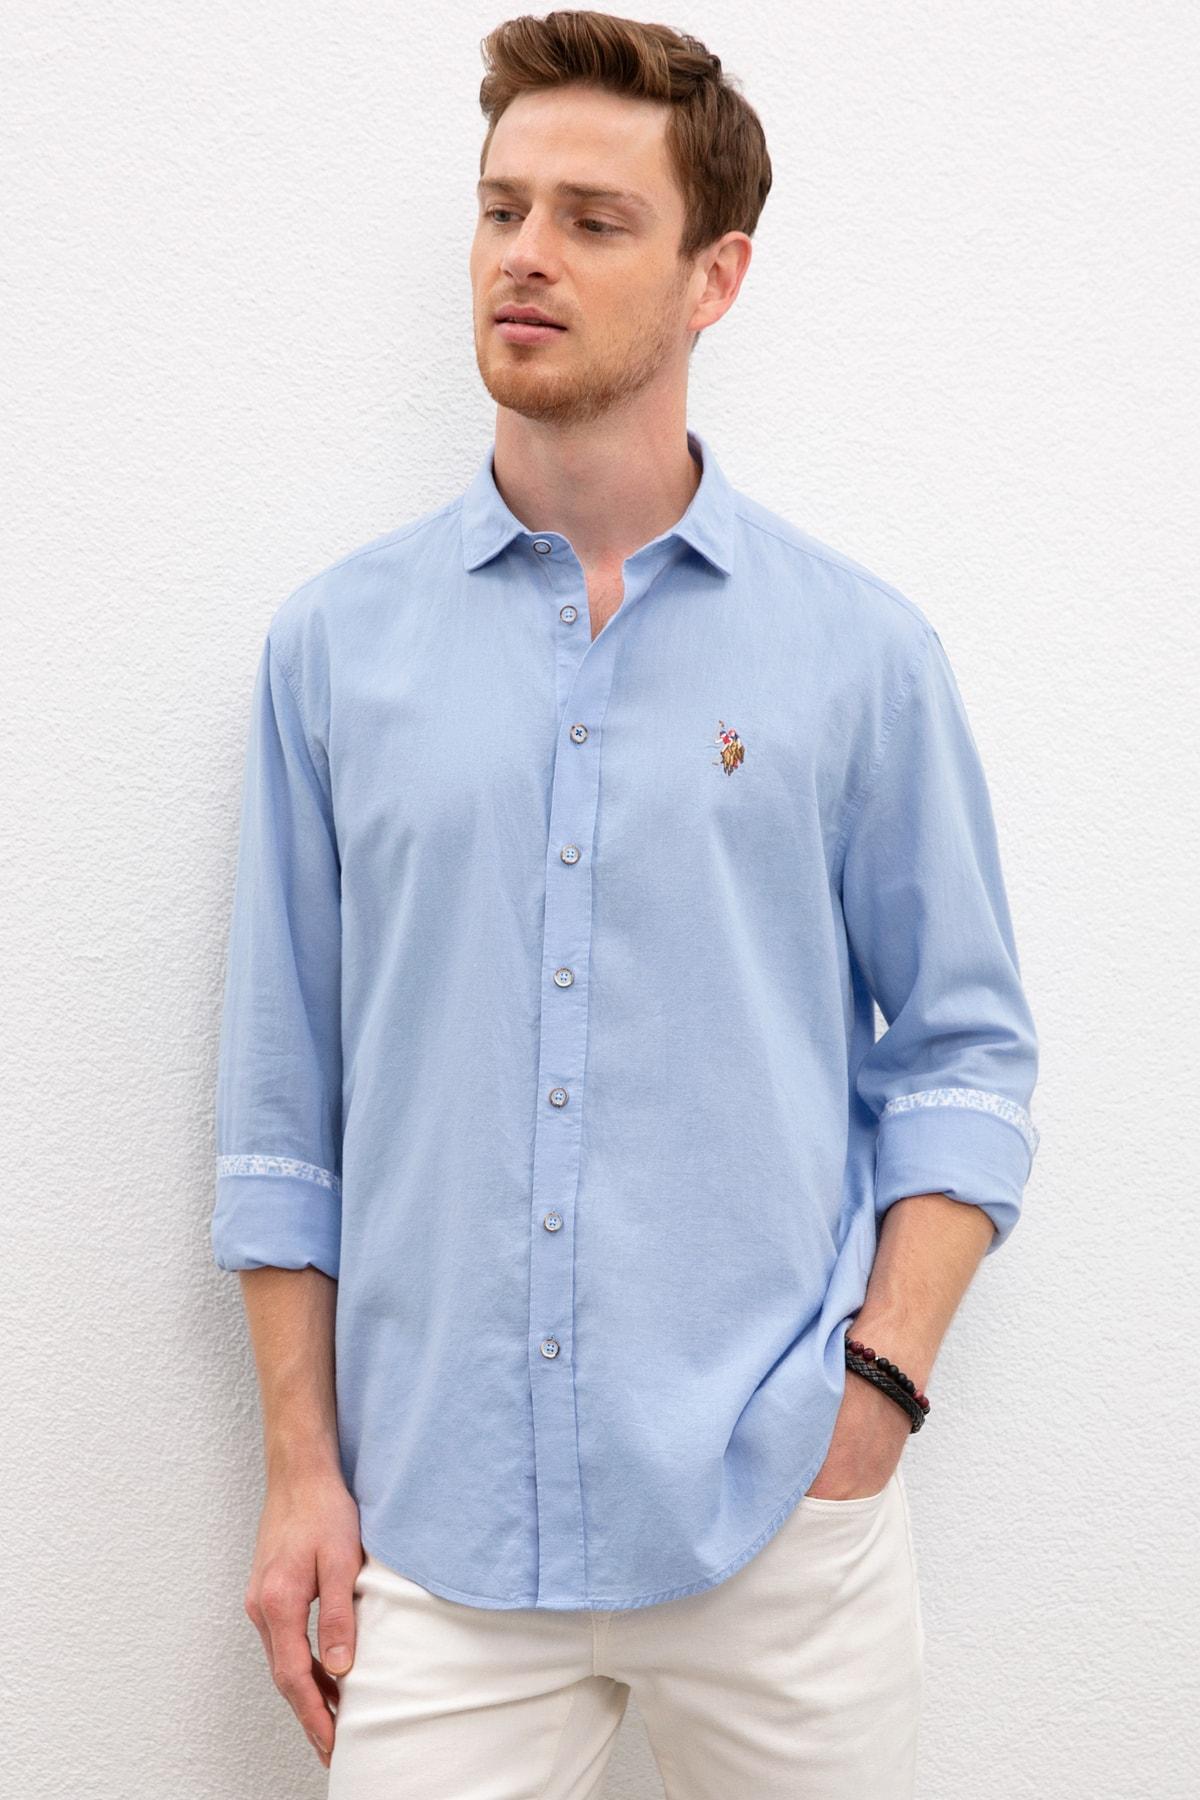 U.S. Polo Assn. Mavı Erkek Gömlek 1